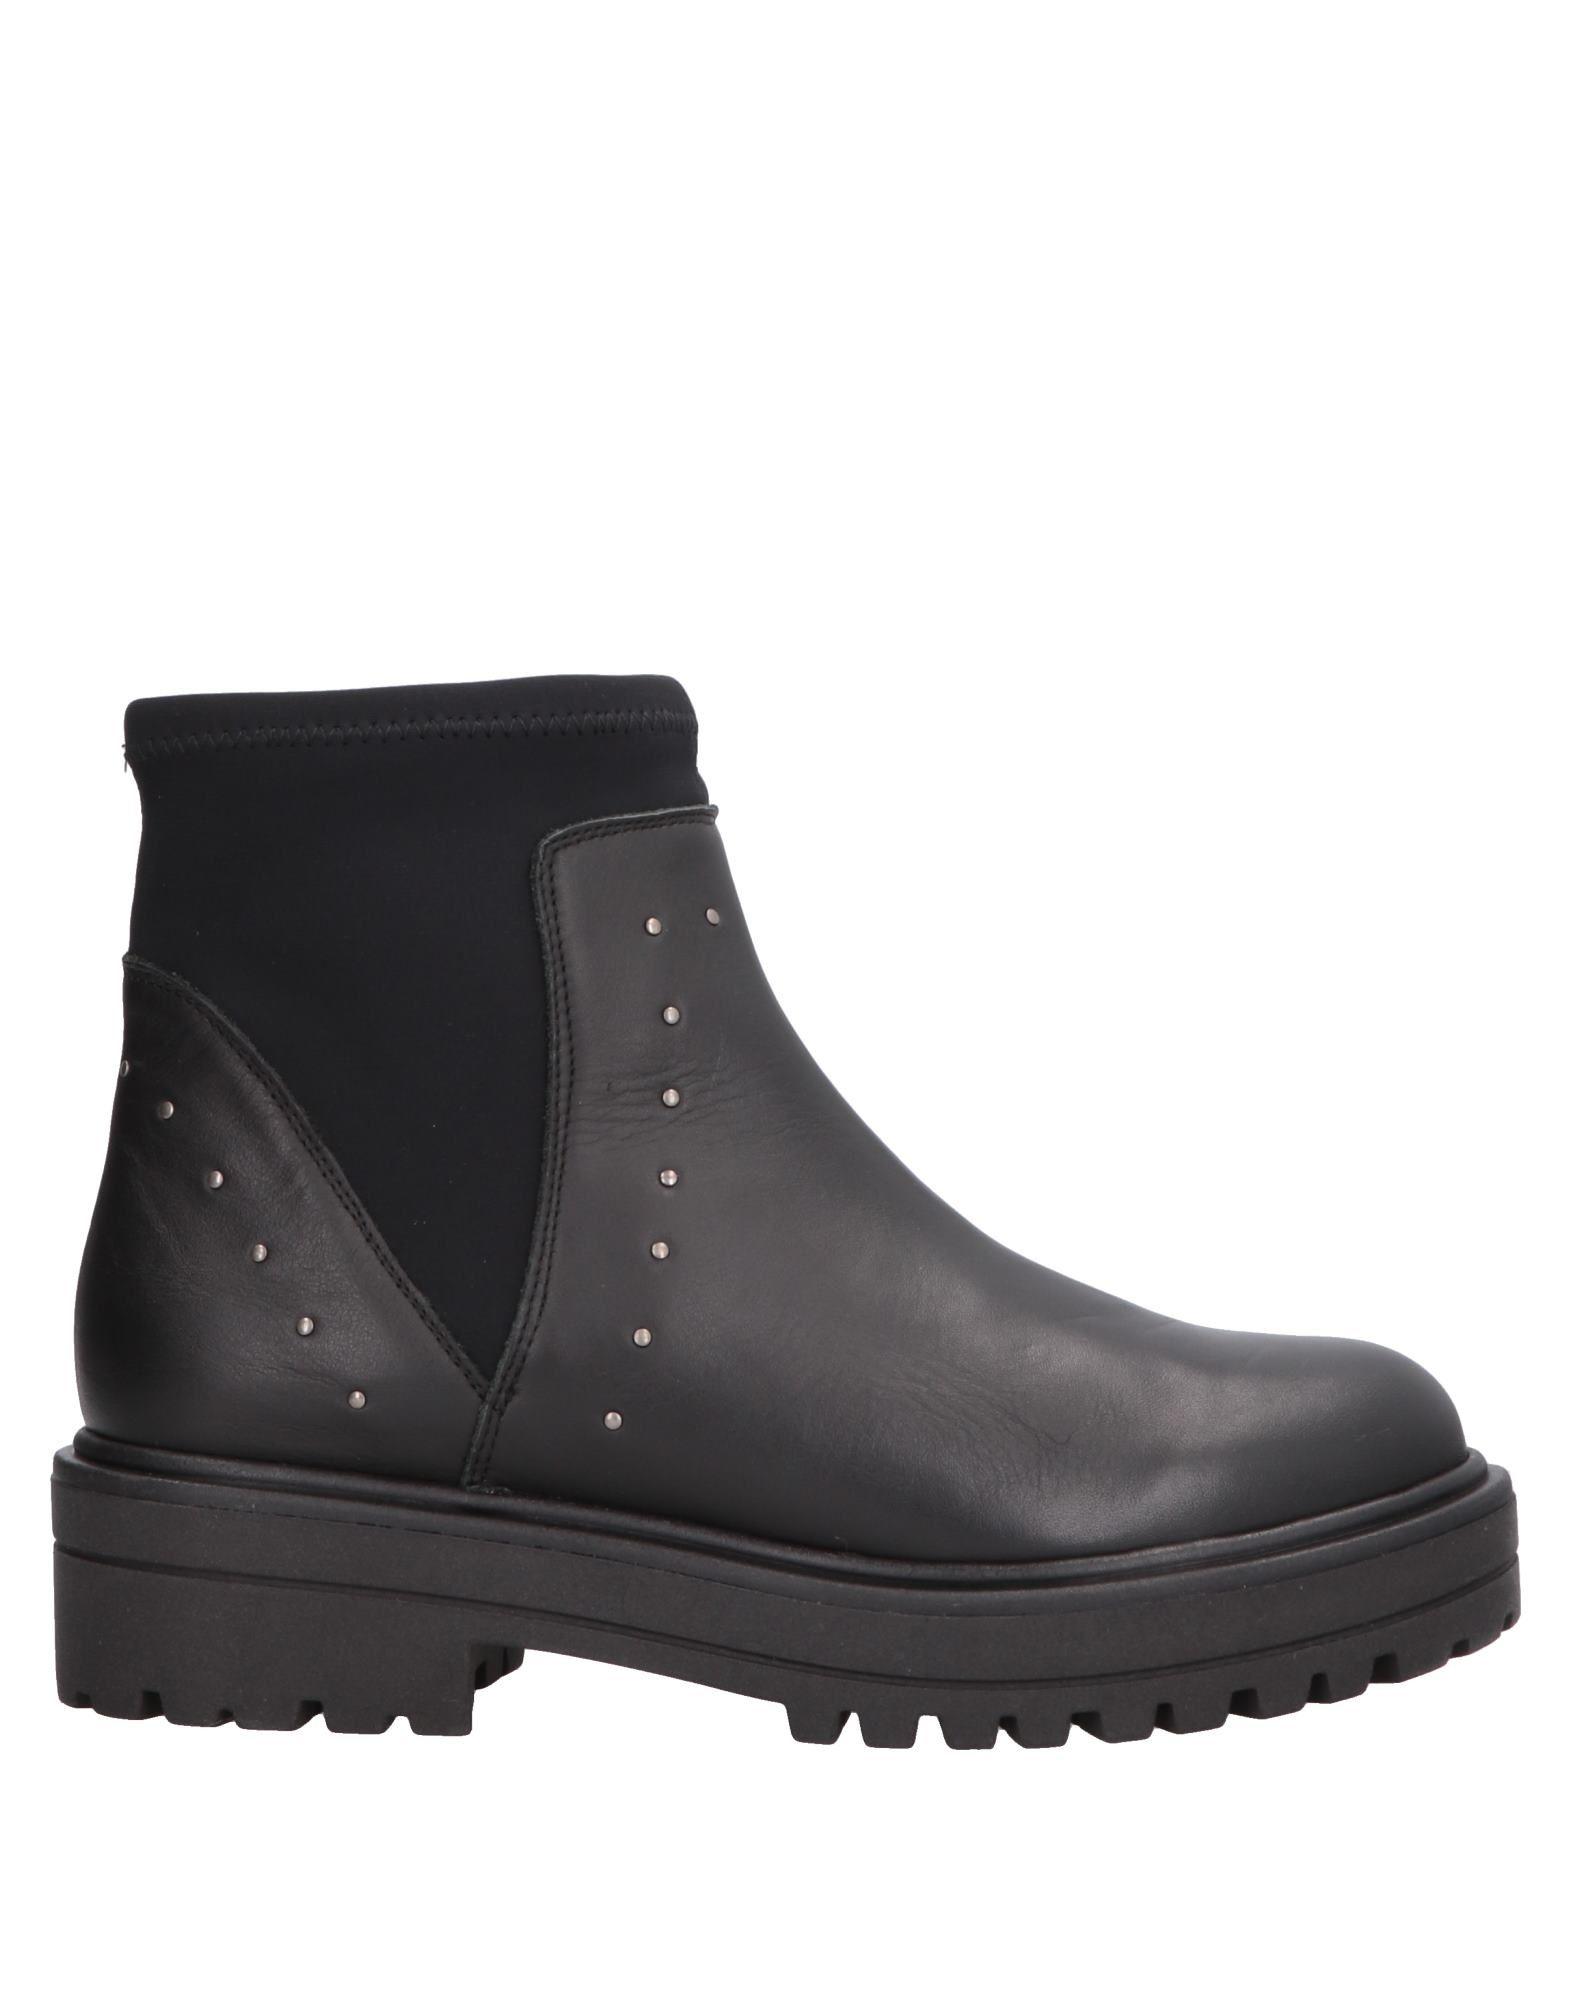 CLAUDIA BY ISABERI Полусапоги и высокие ботинки